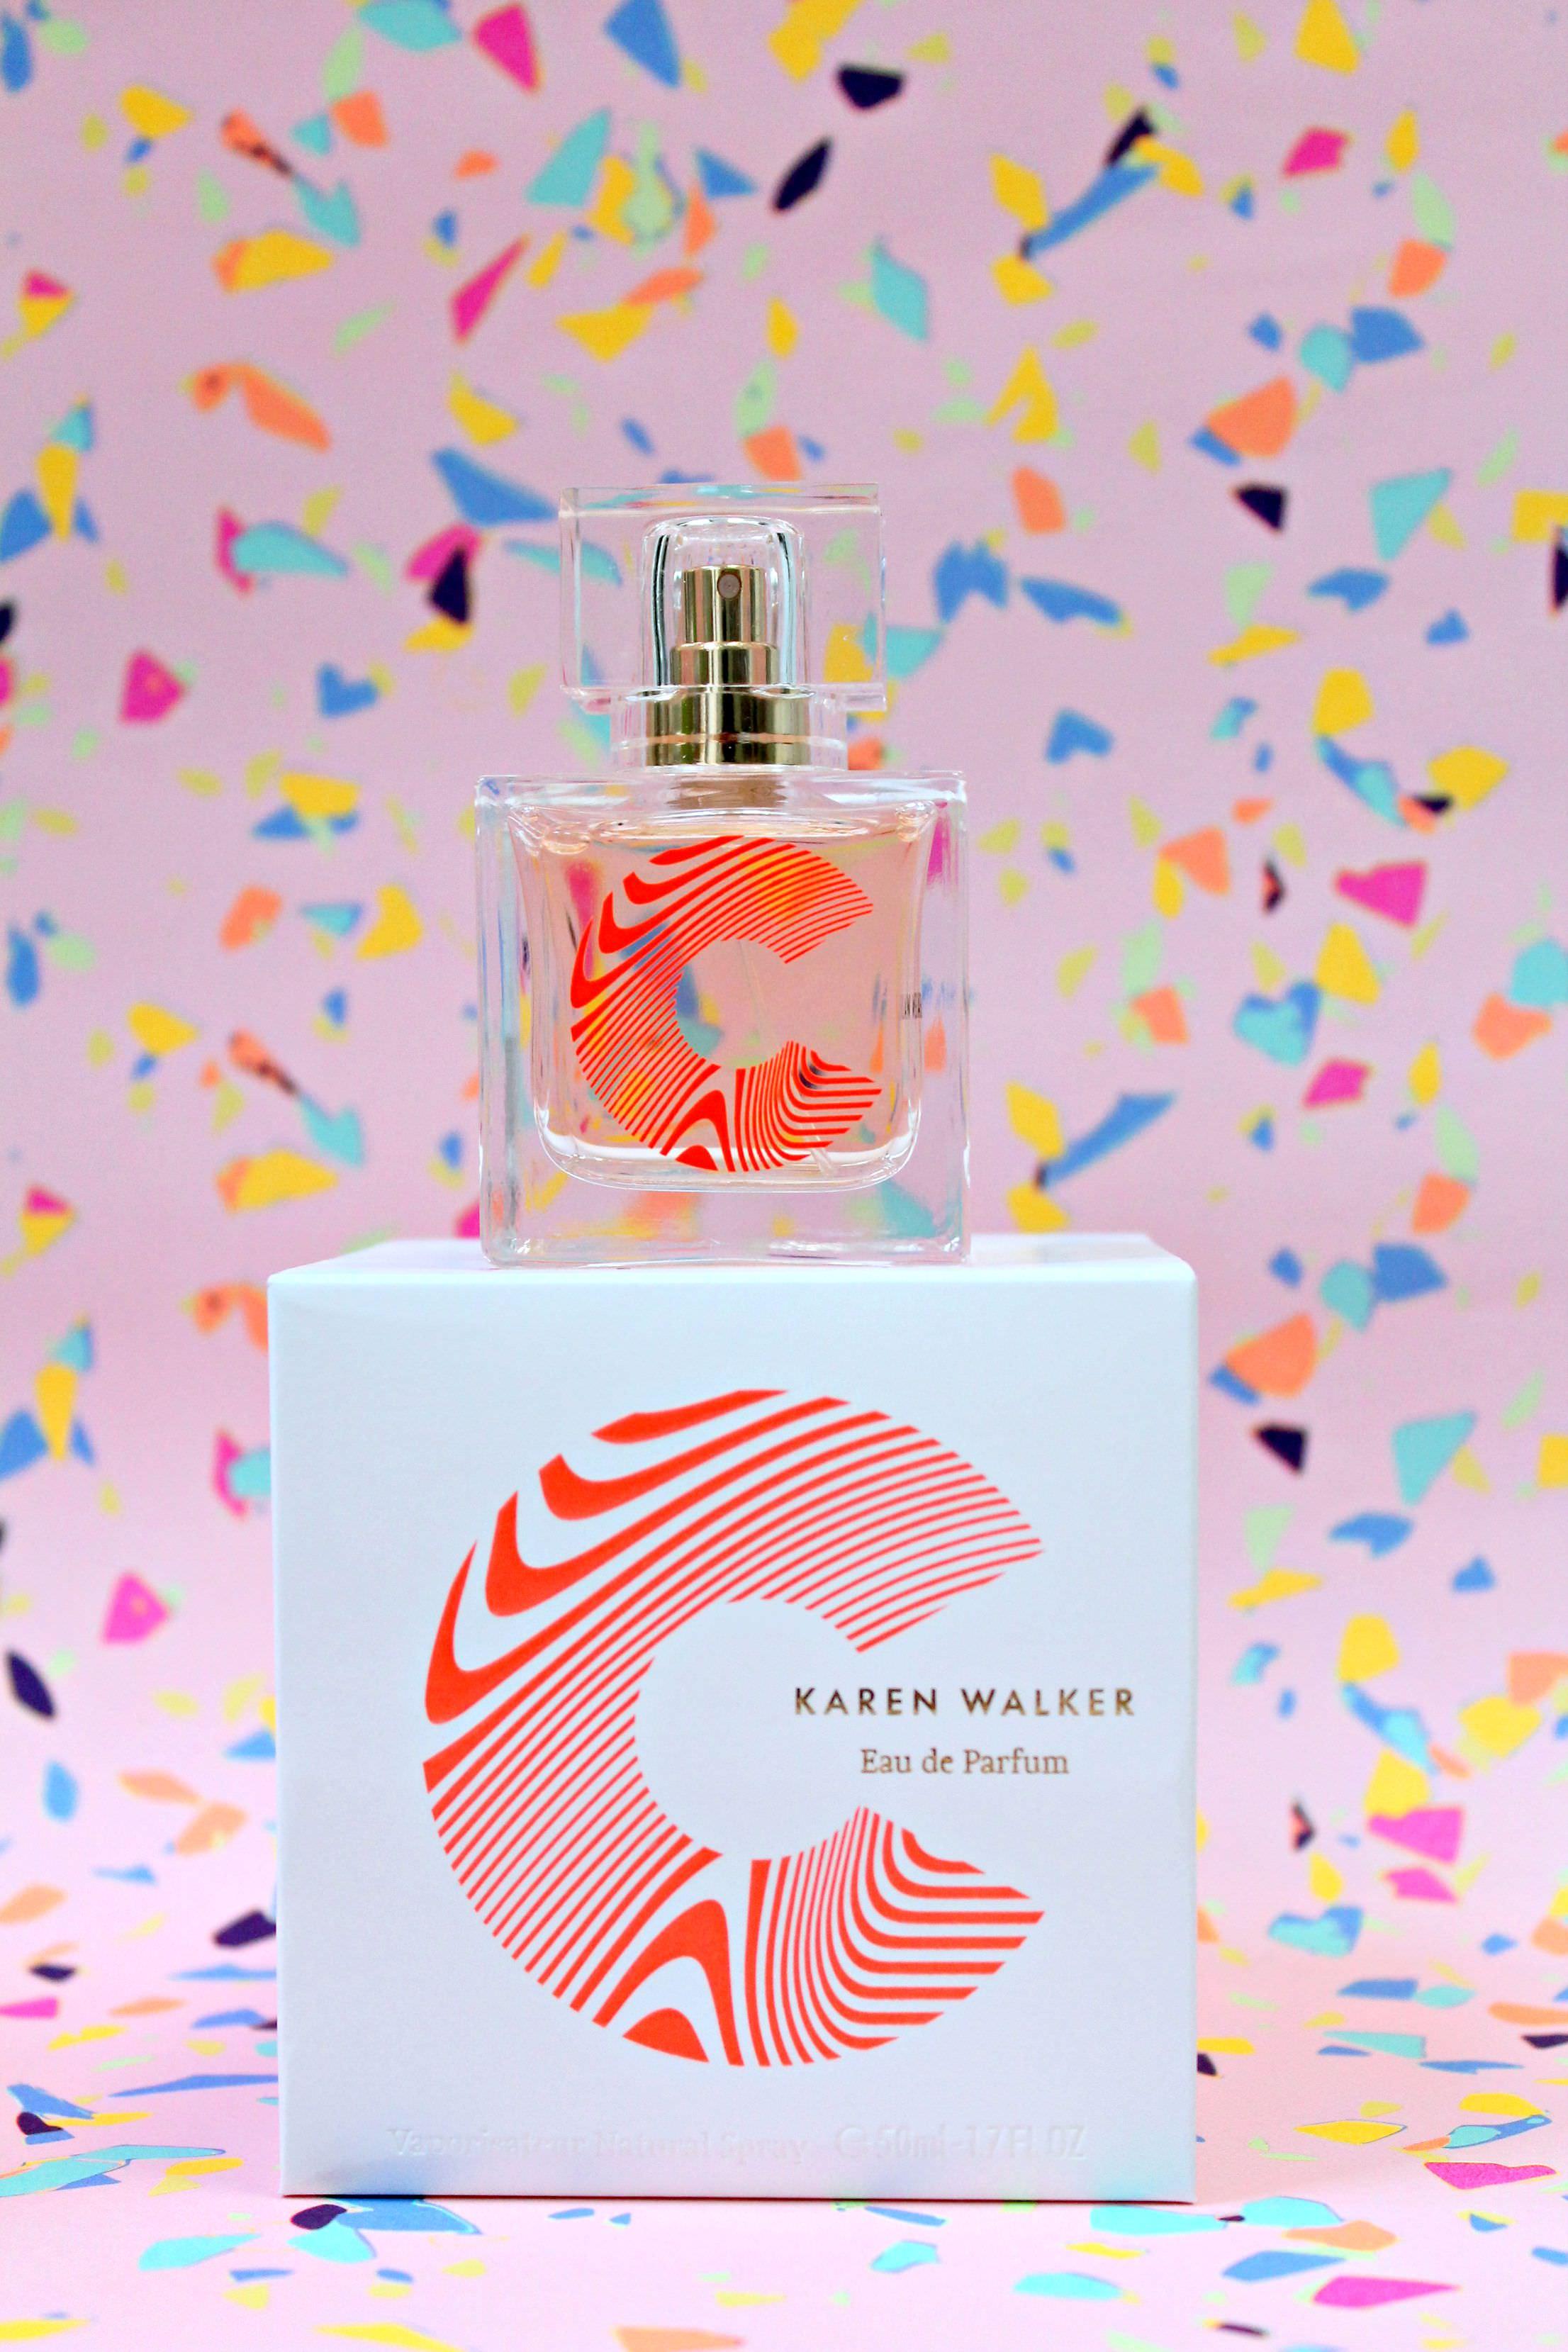 Karen-Walker-C-perfume-photo-by-Little-Big-Bell